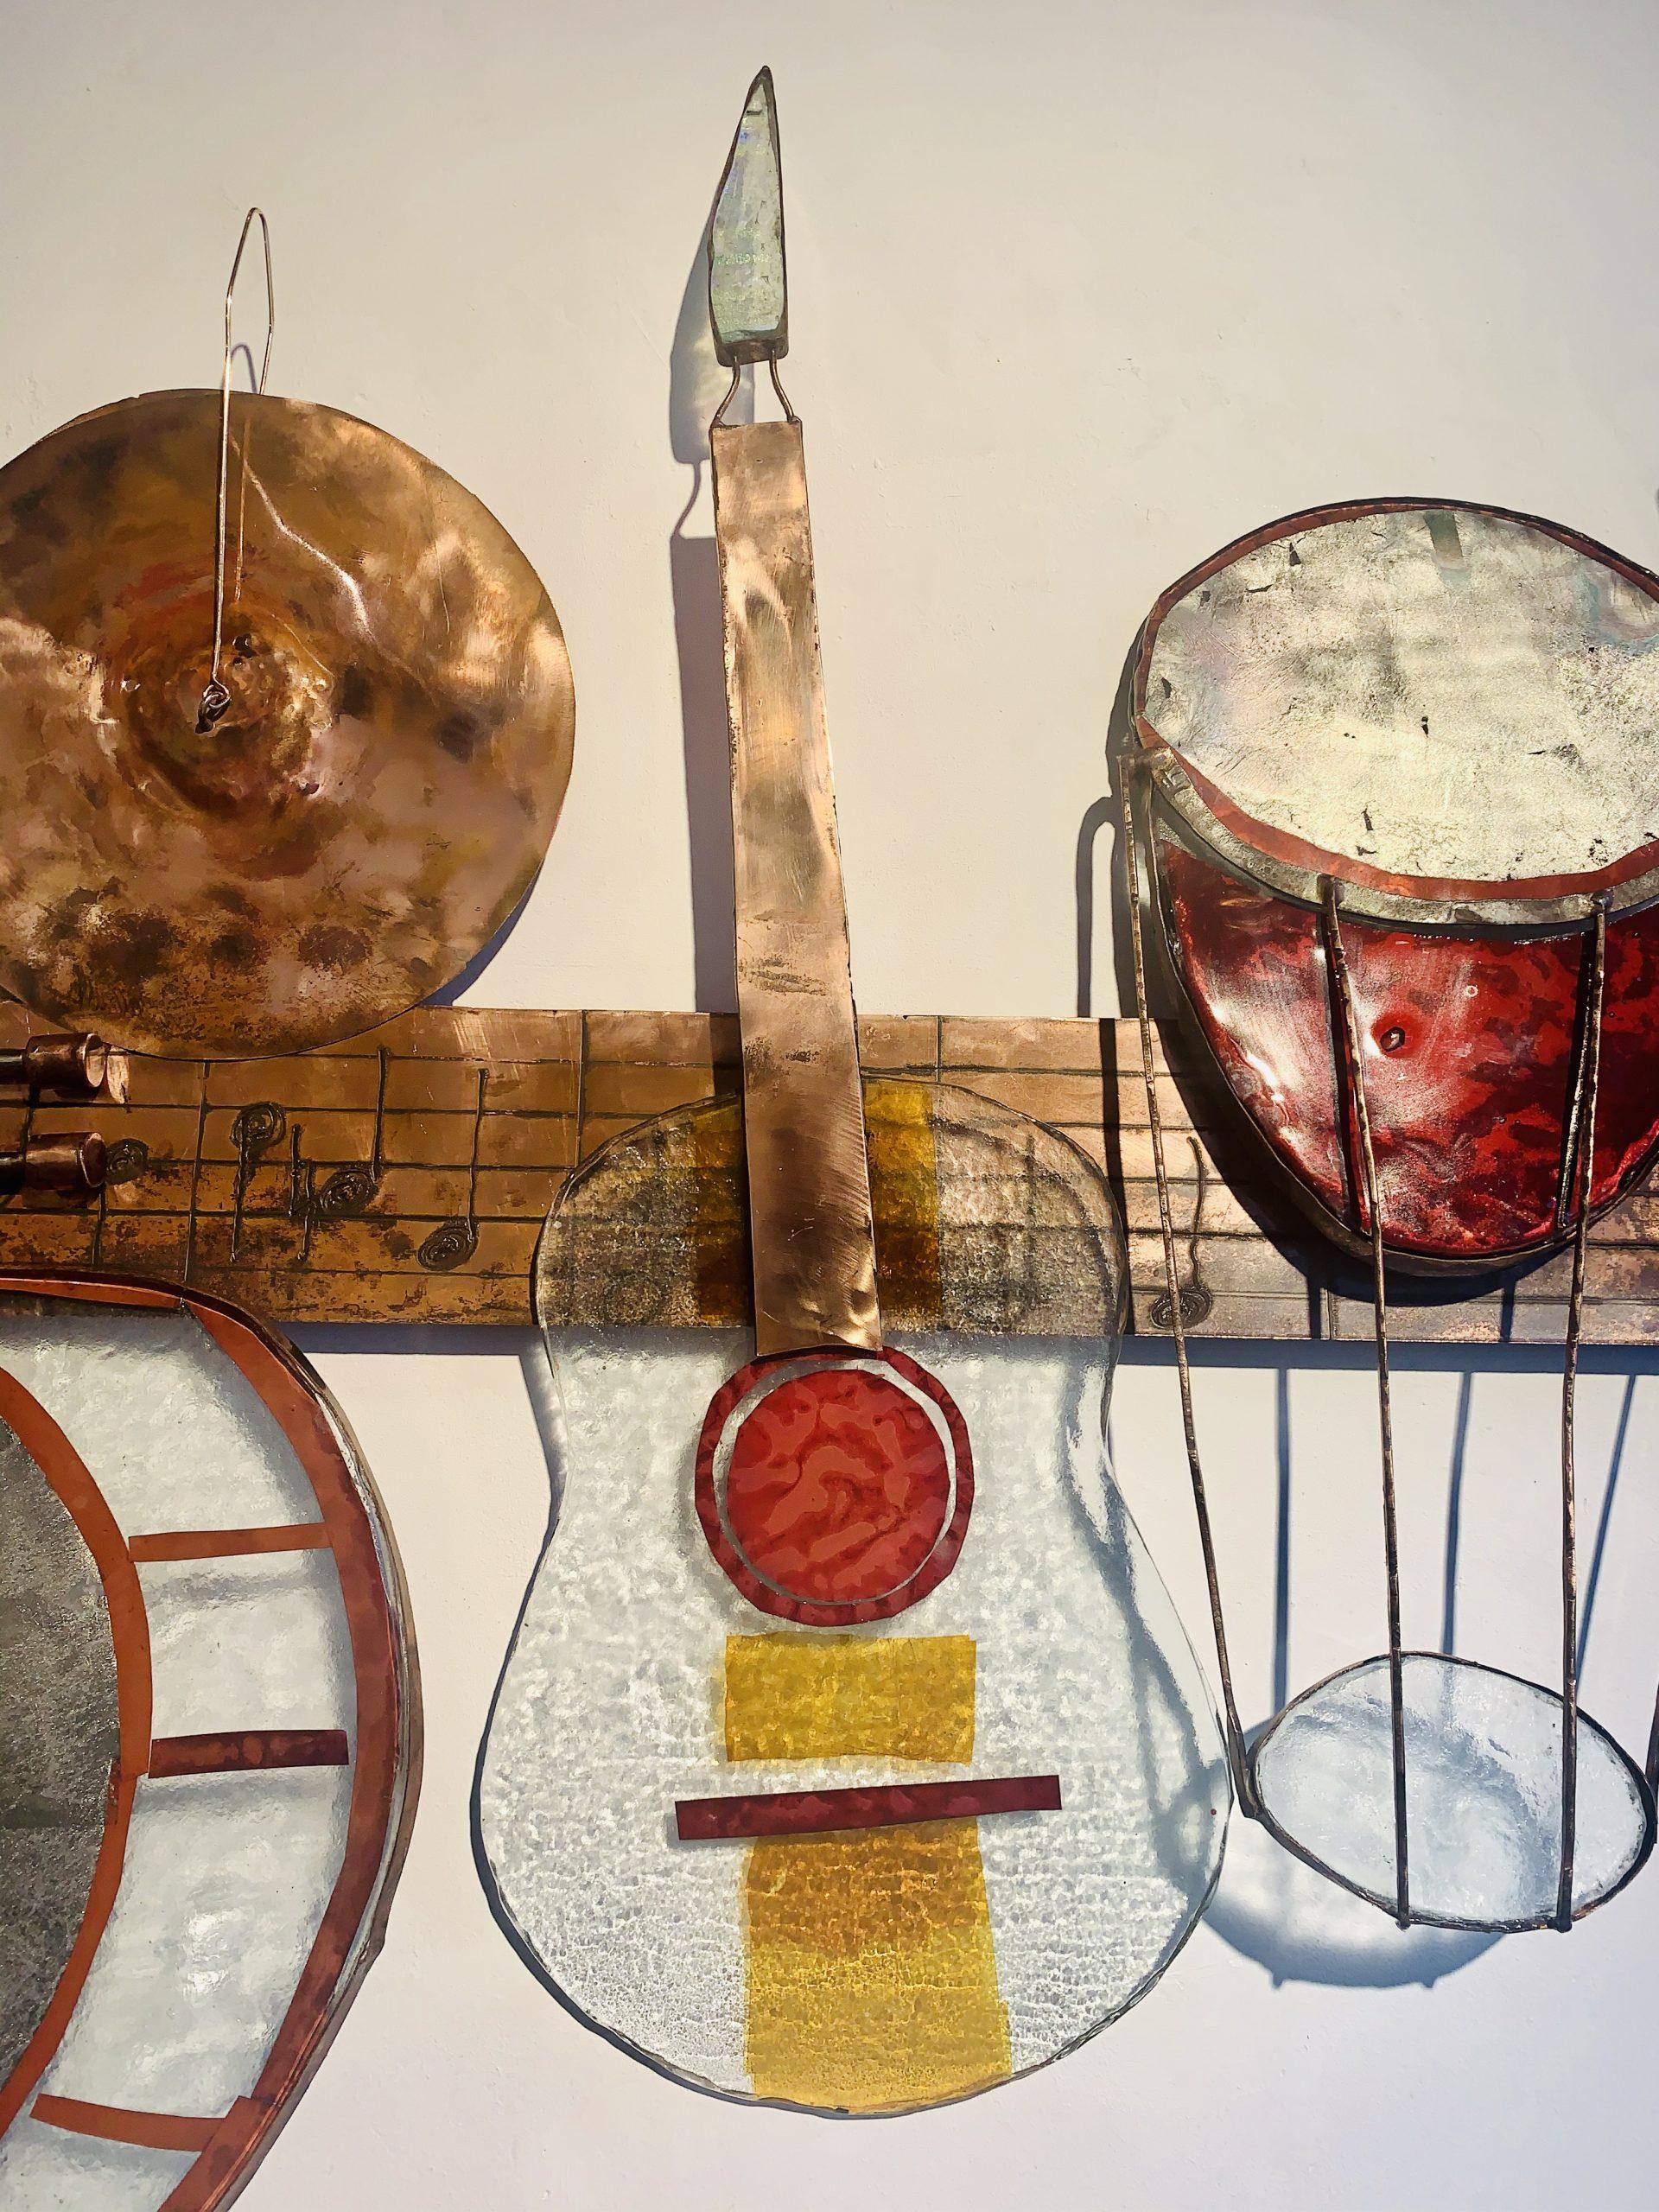 Wandobject muziekinstrumenten klant Funs Uiting SJAAK SMETSERS1